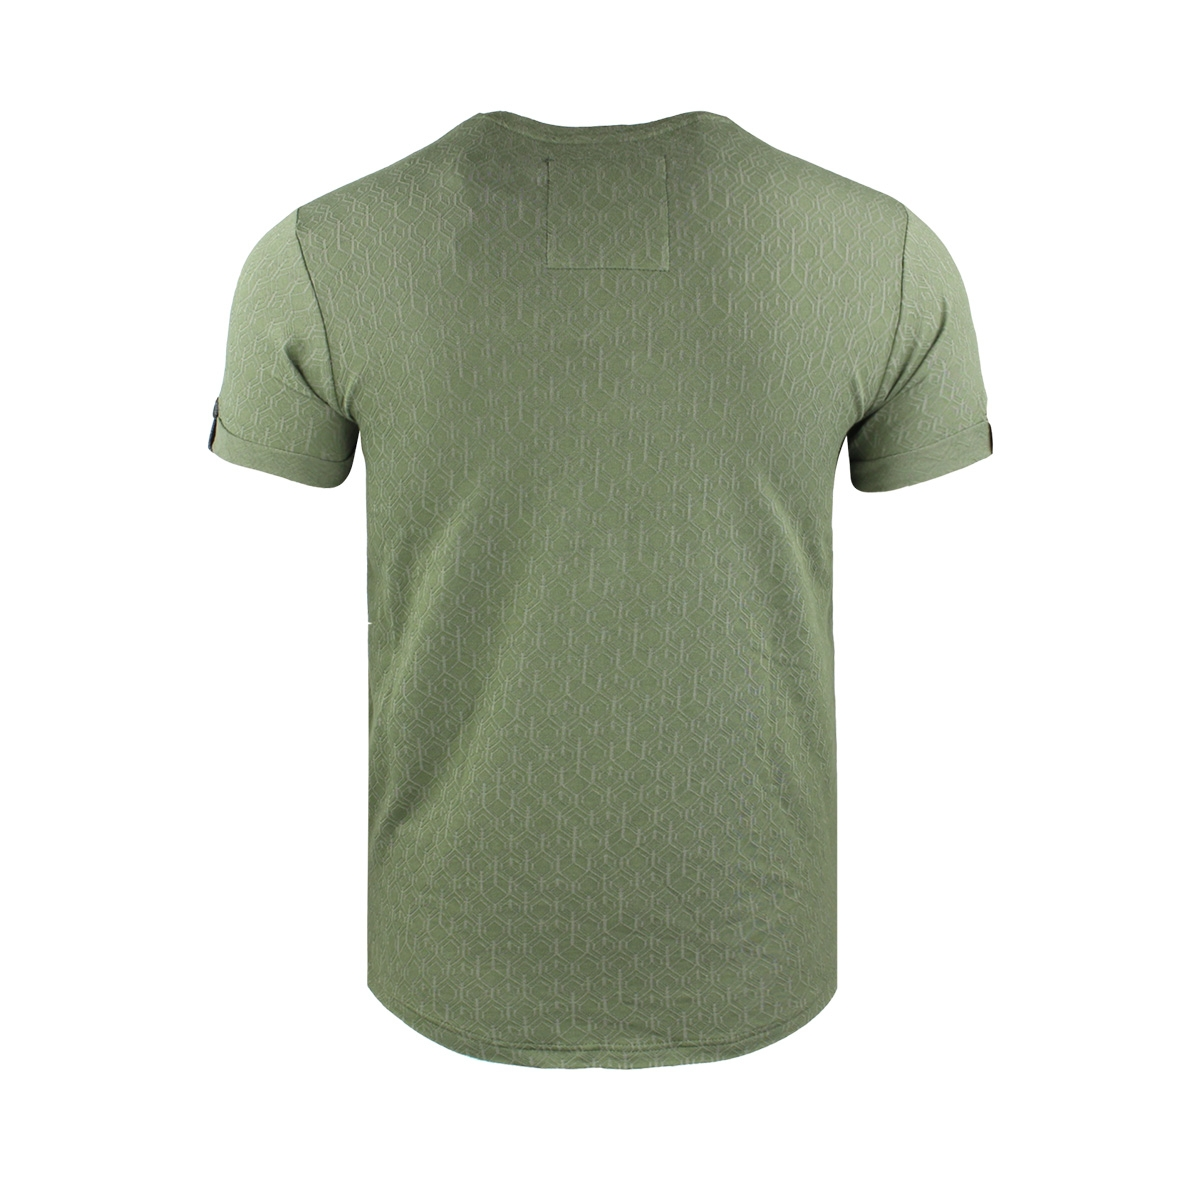 t shirt 15171 gabbiano t-shirt olive